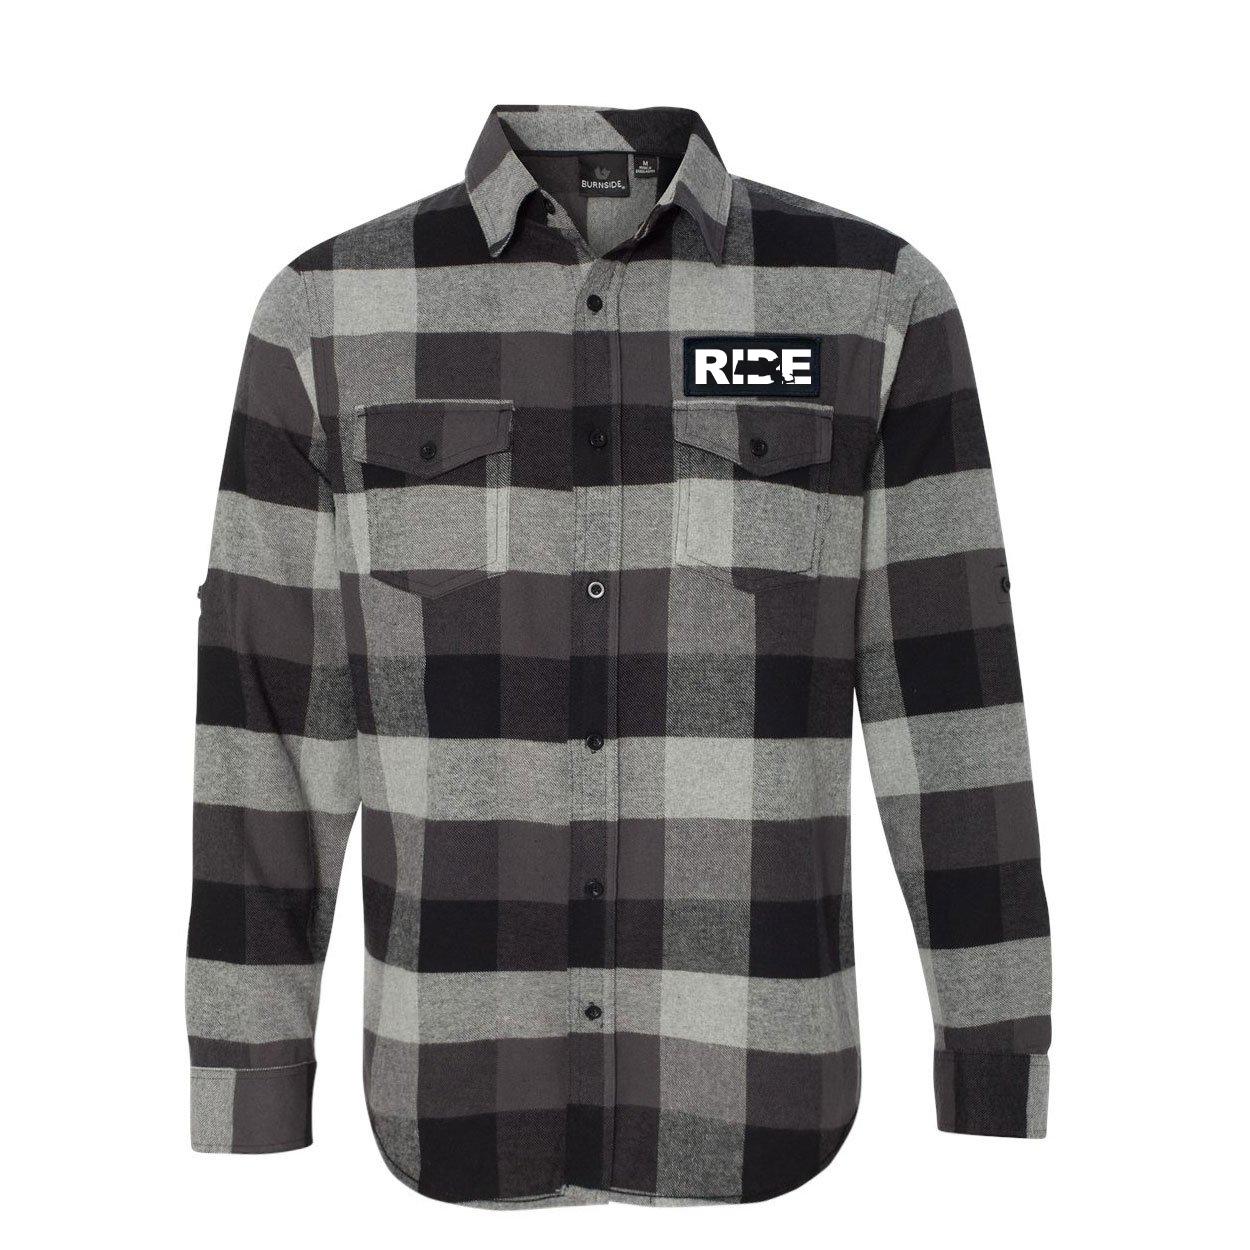 Ride Massachusetts Classic Unisex Long Sleeve Woven Patch Flannel Shirt Black/Gray (White Logo)